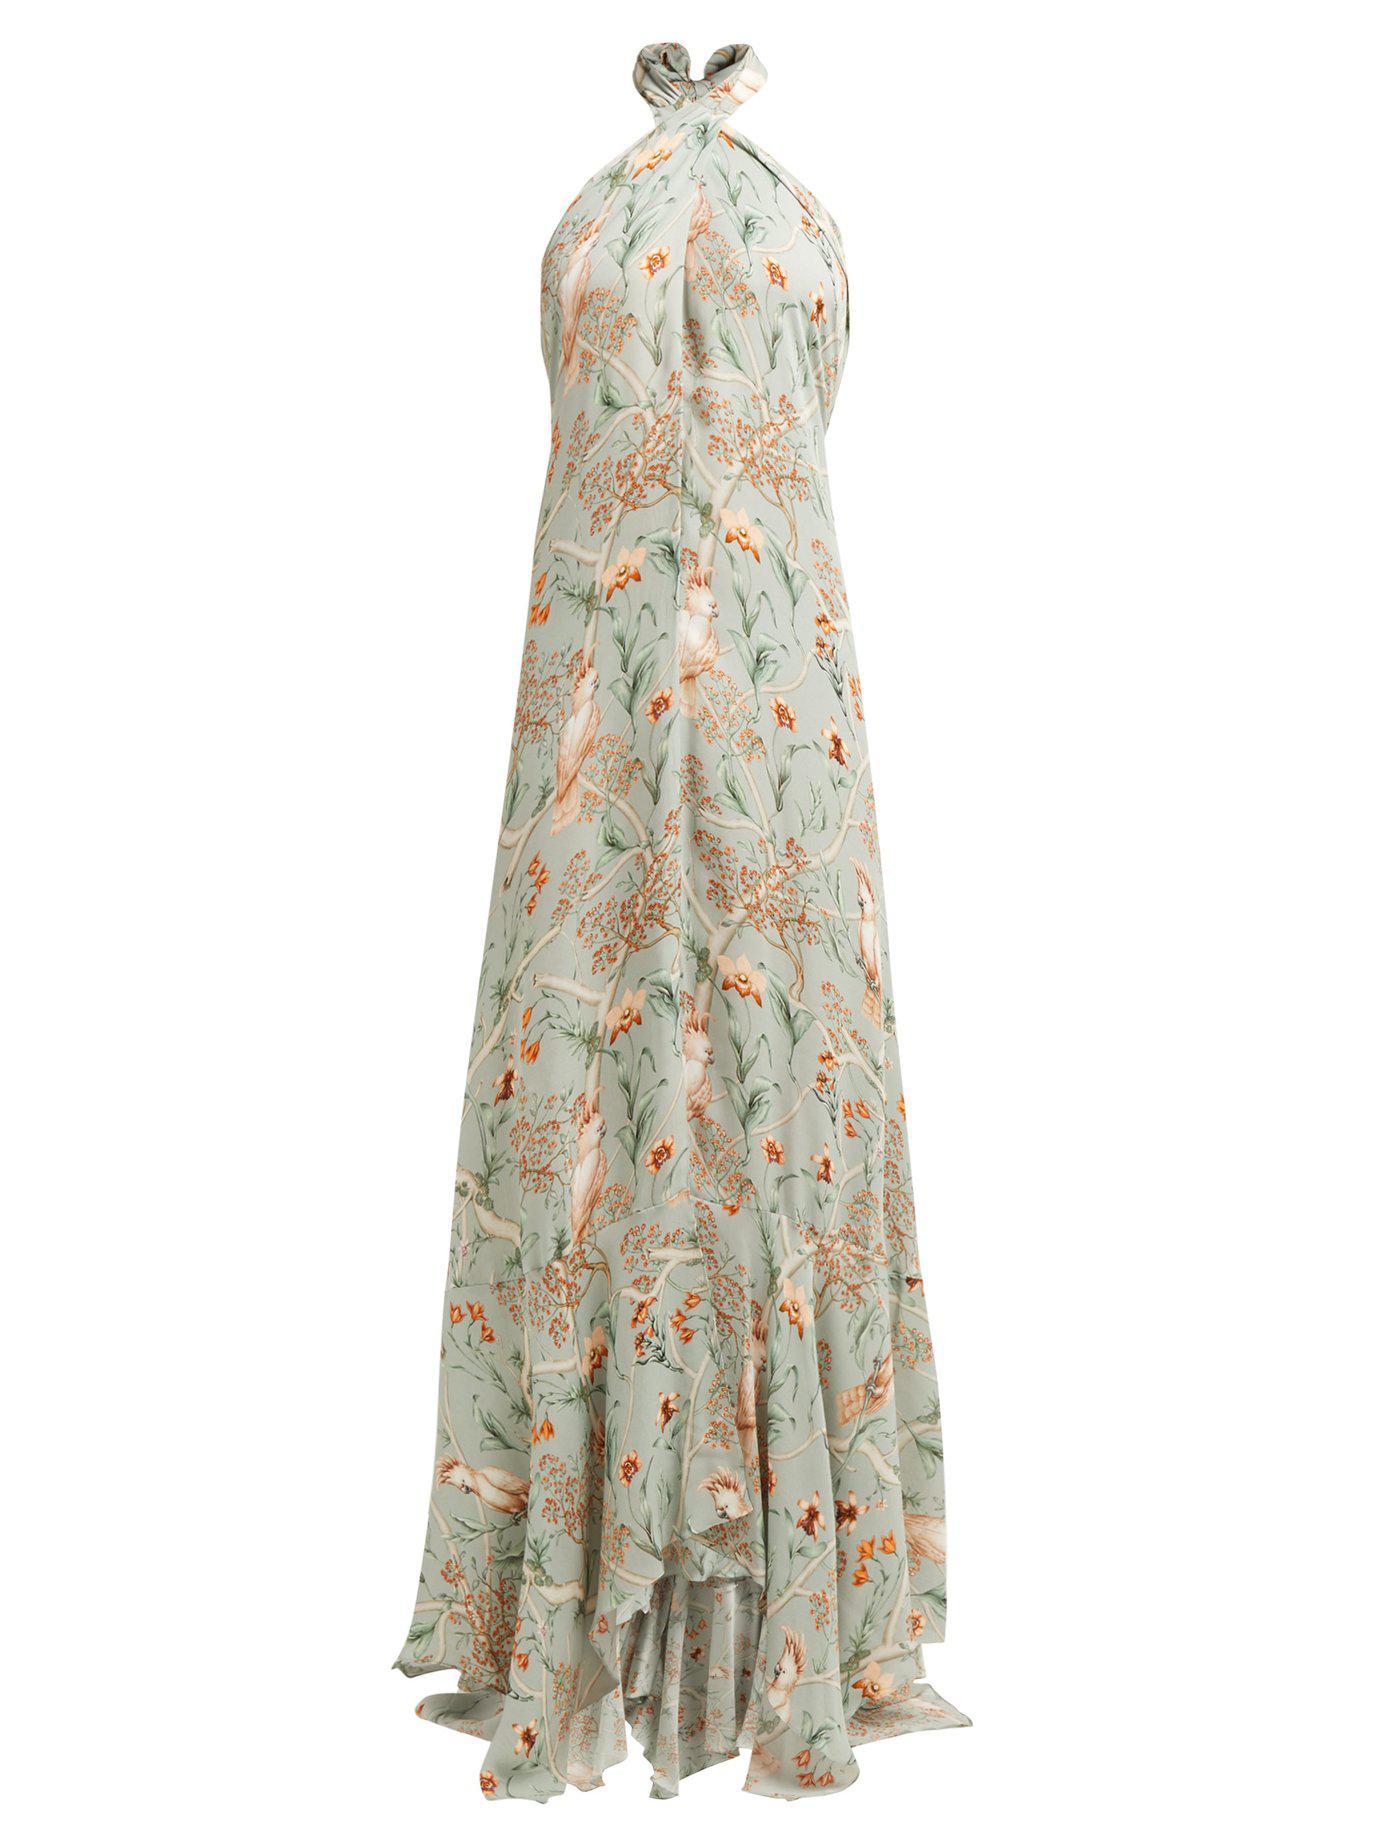 1bbd3fa4b15 Lyst - Johanna Ortiz Vanuato Floral Print Silk Georgette Gown in Blue